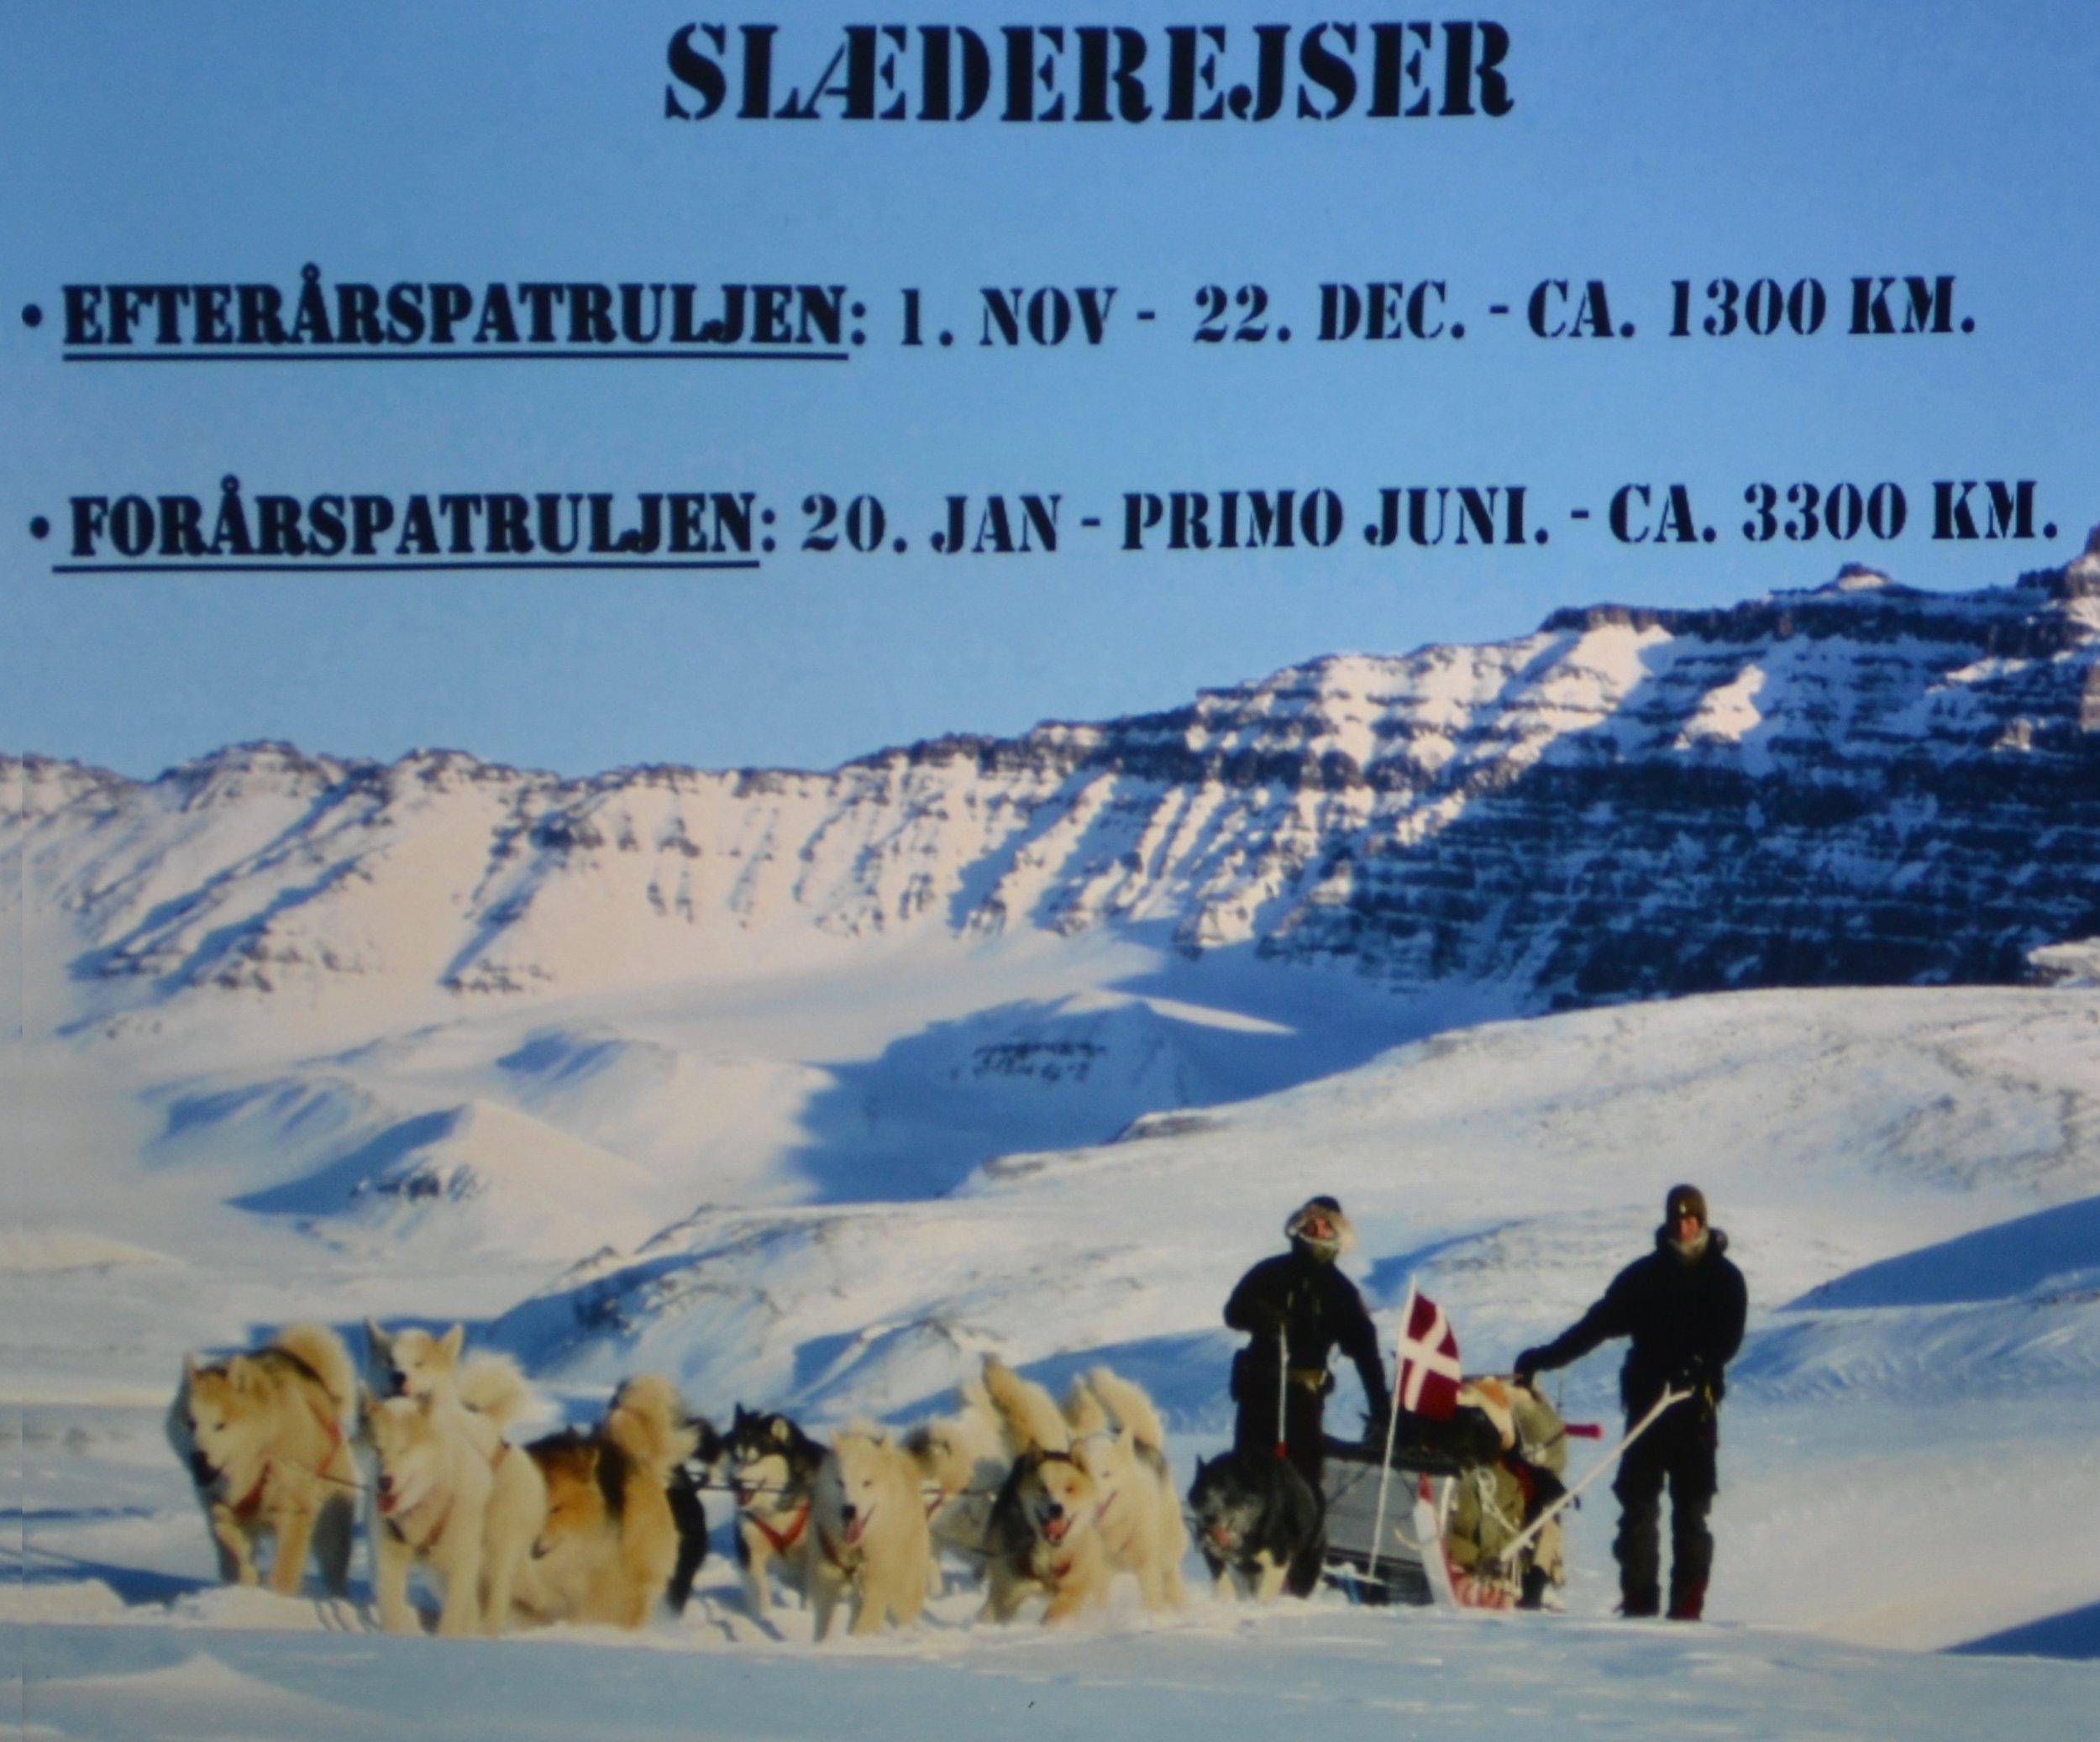 Et typisk vinterprogram for en Sirius-patrulje